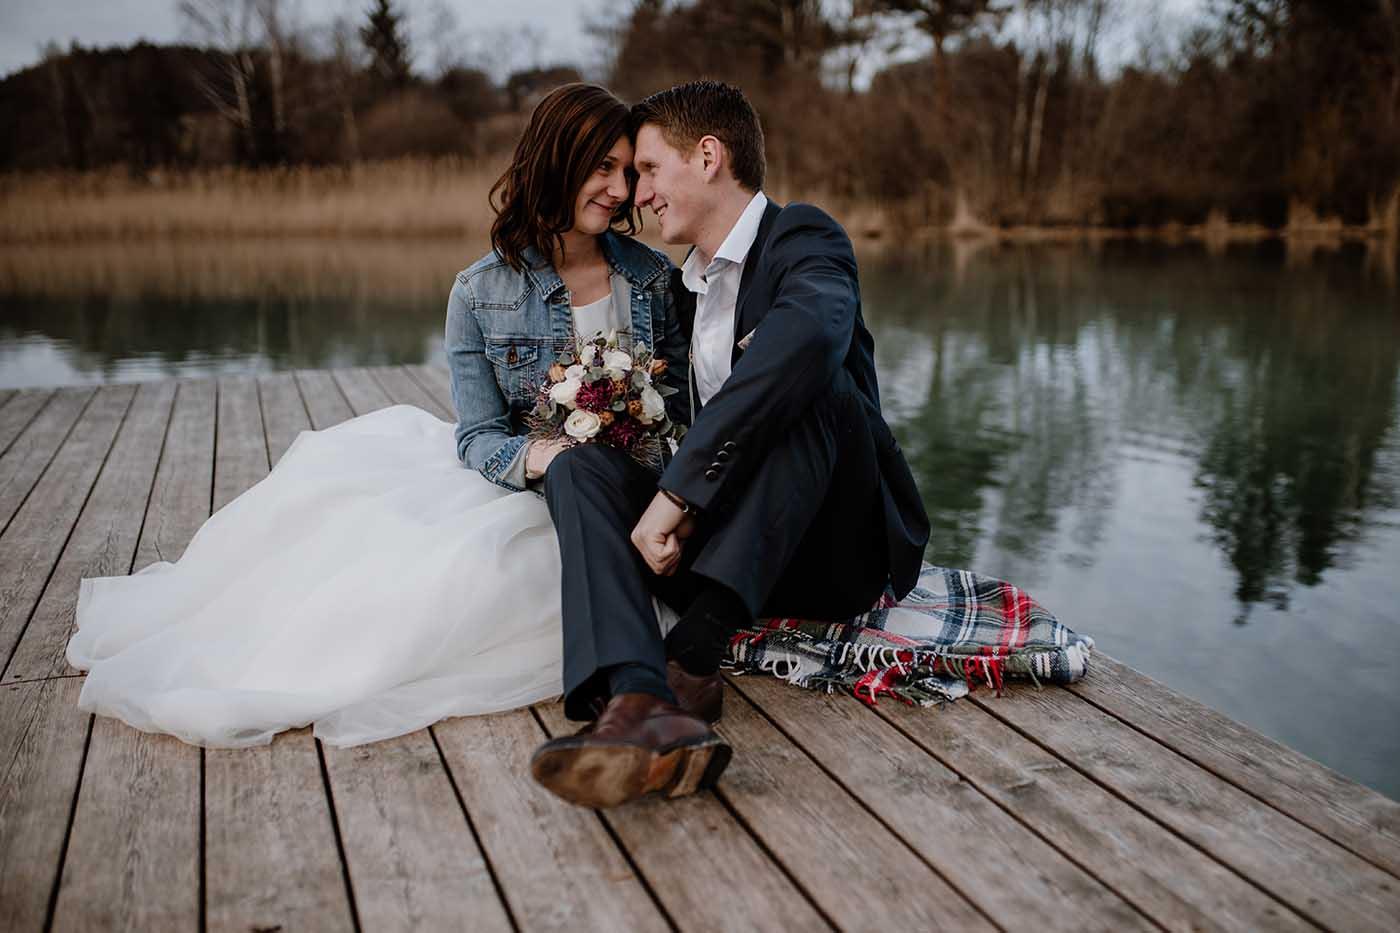 neli fotografie   Hochzeitsfotografin